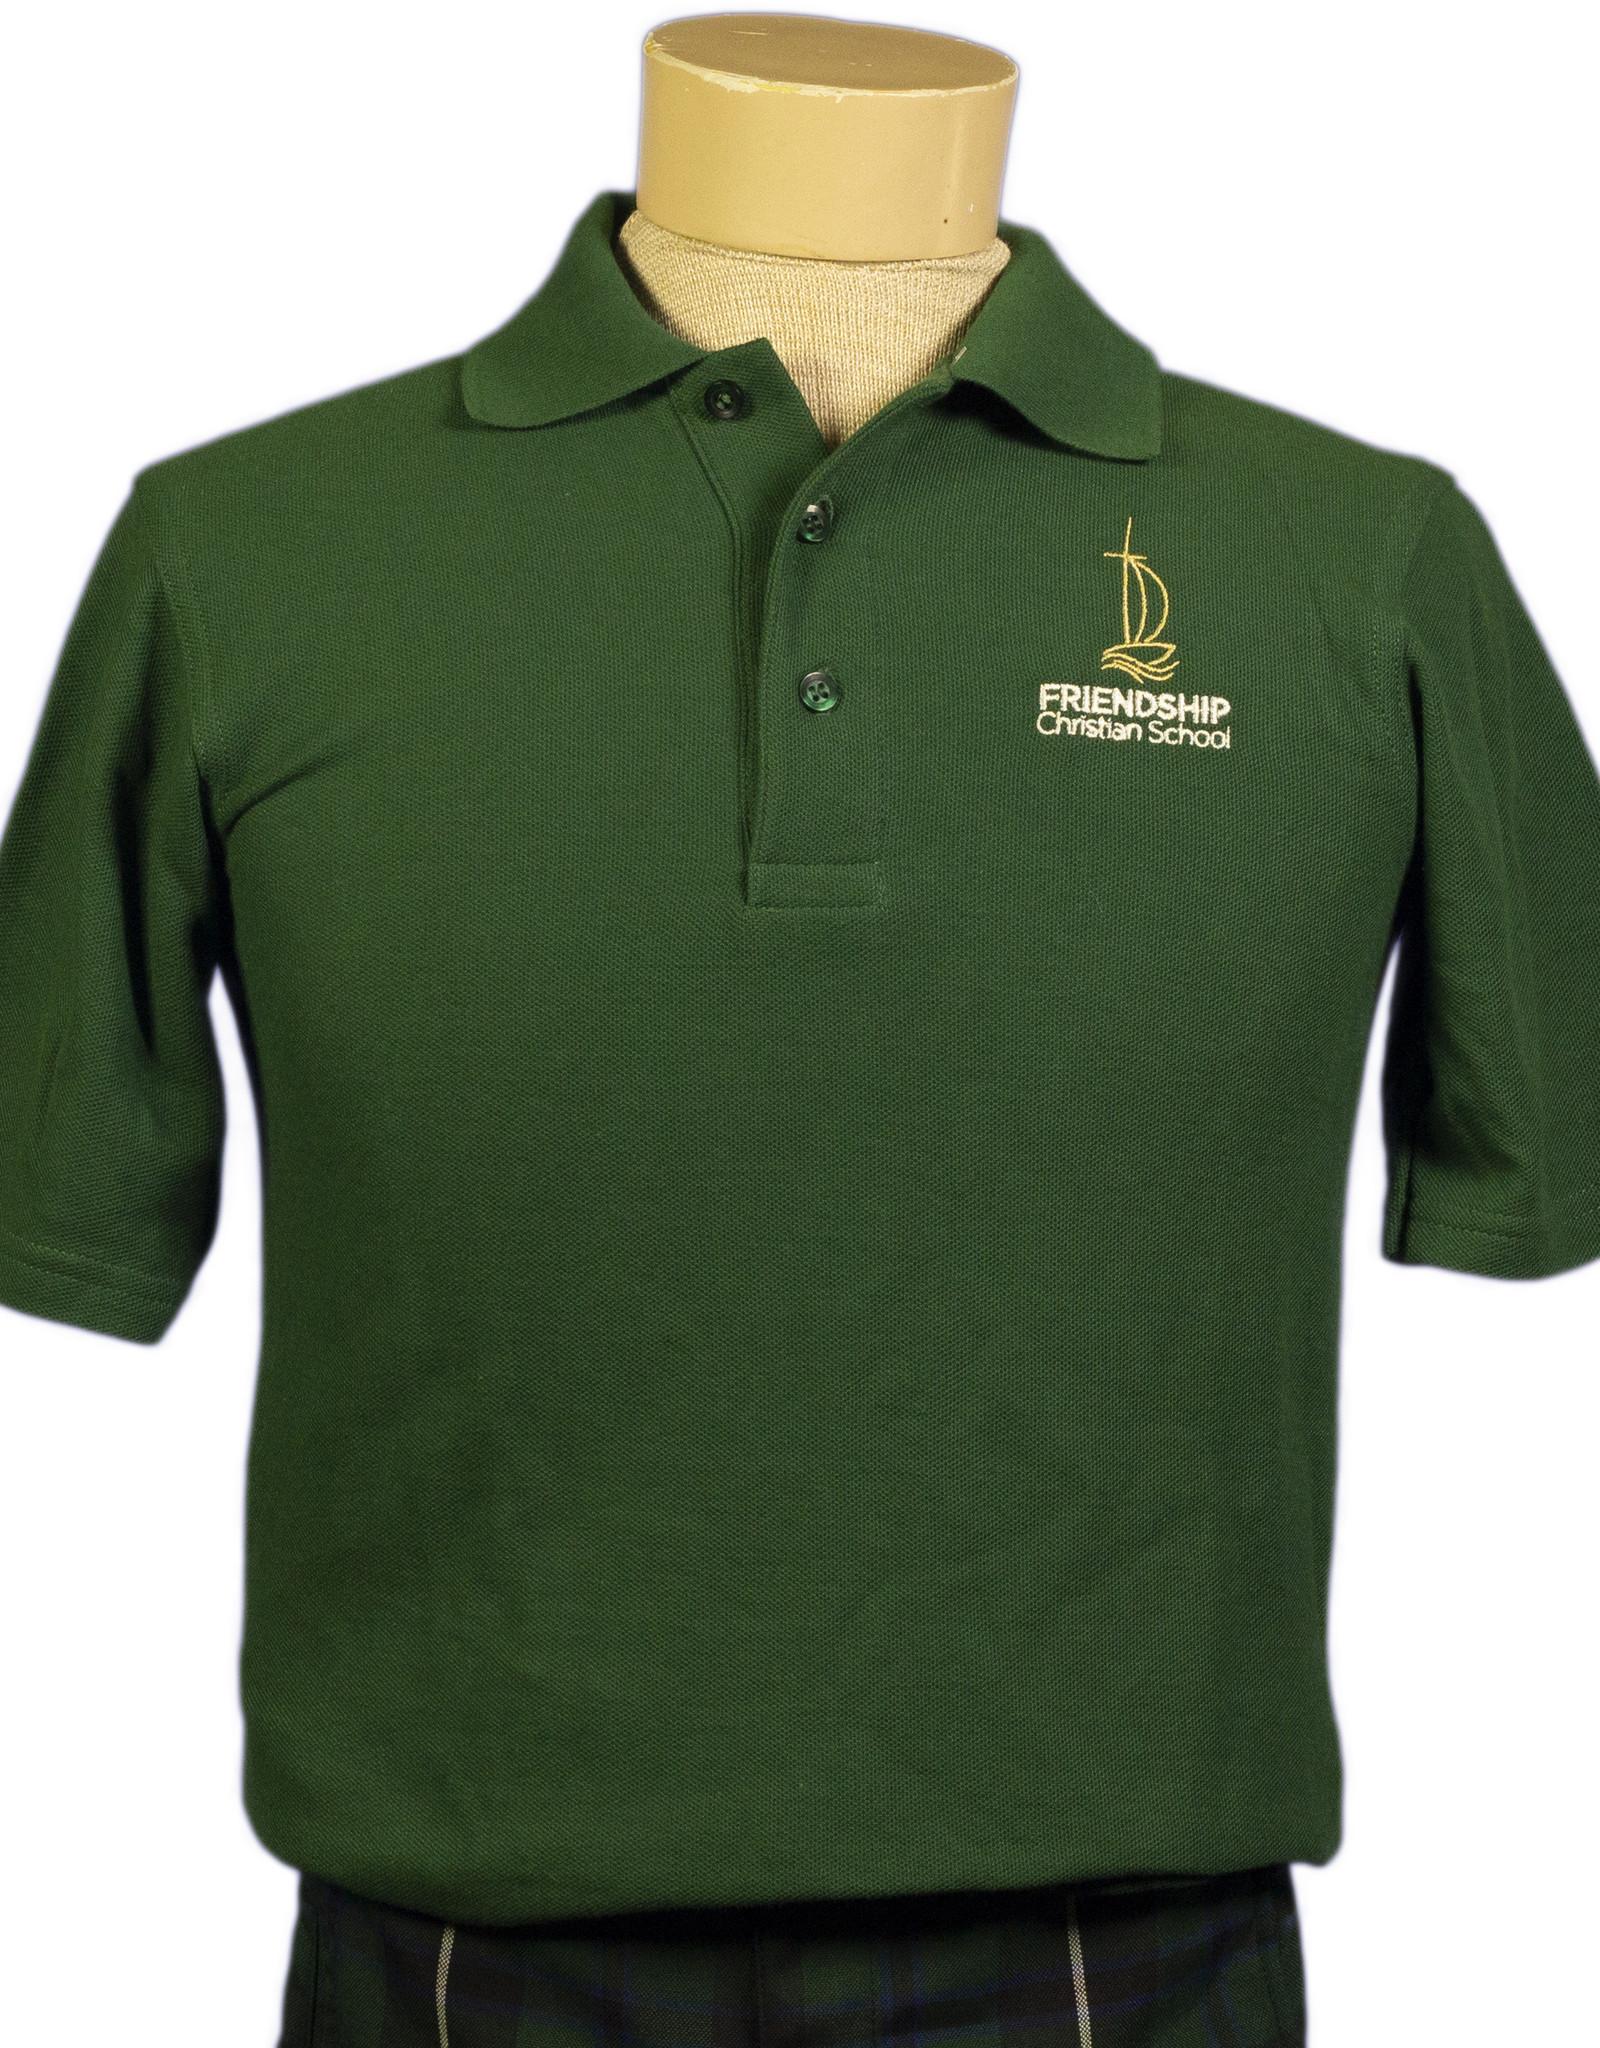 Polo - Unisex -Short Sleeve - Pique - Youth